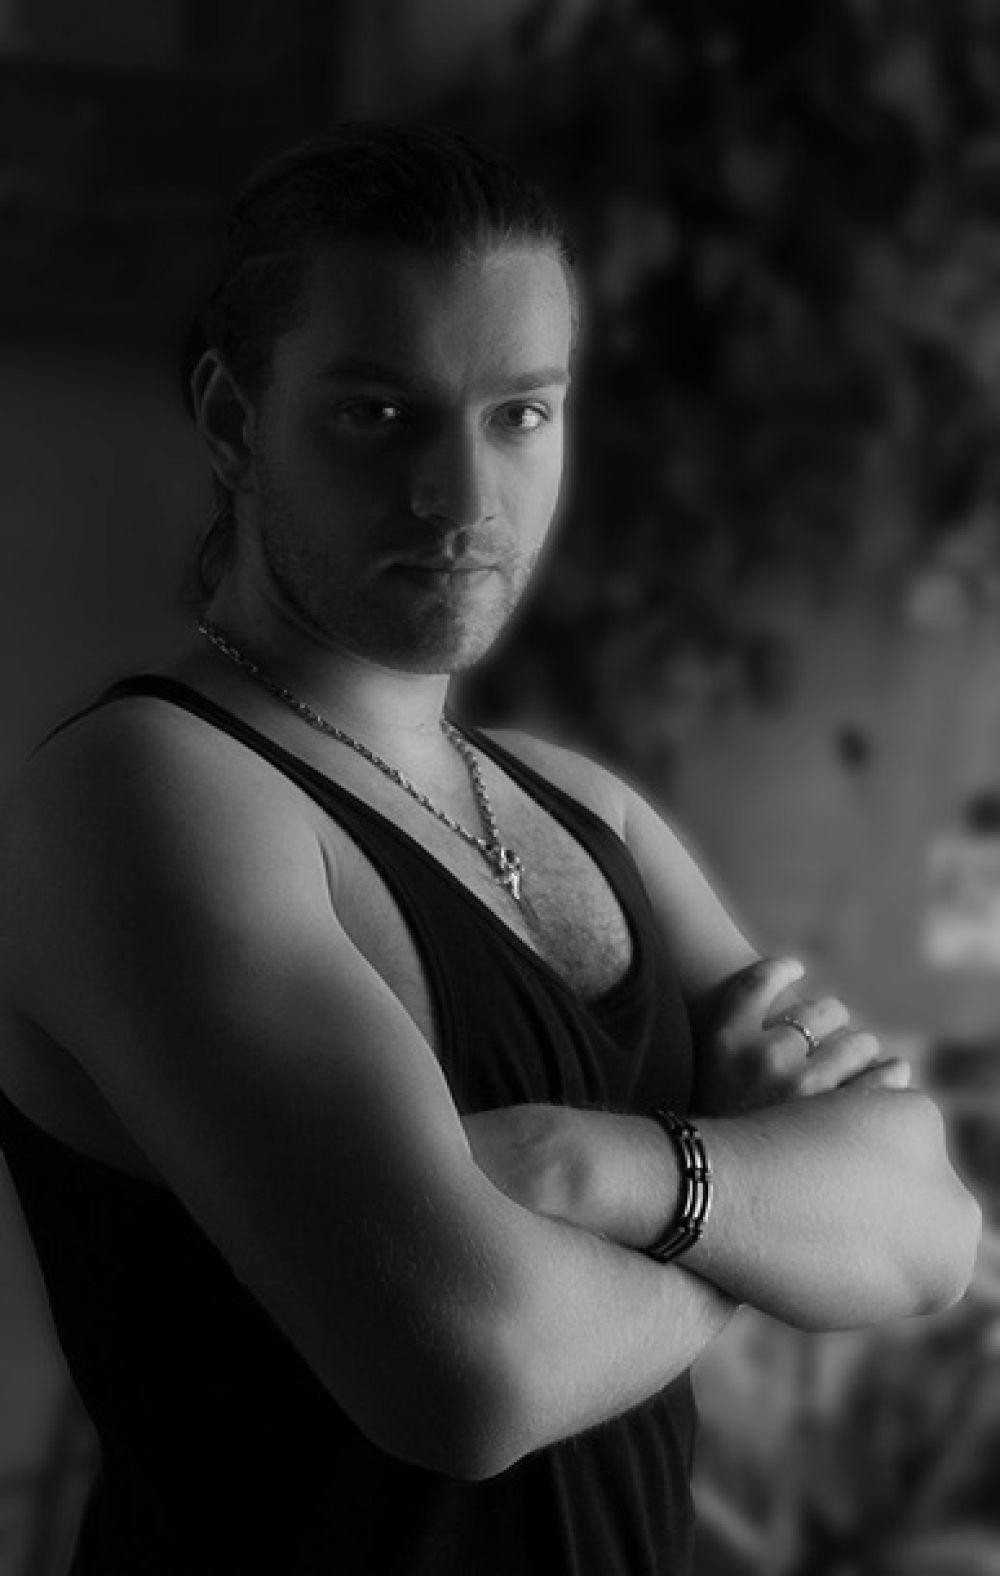 Богдан Юсыпчук